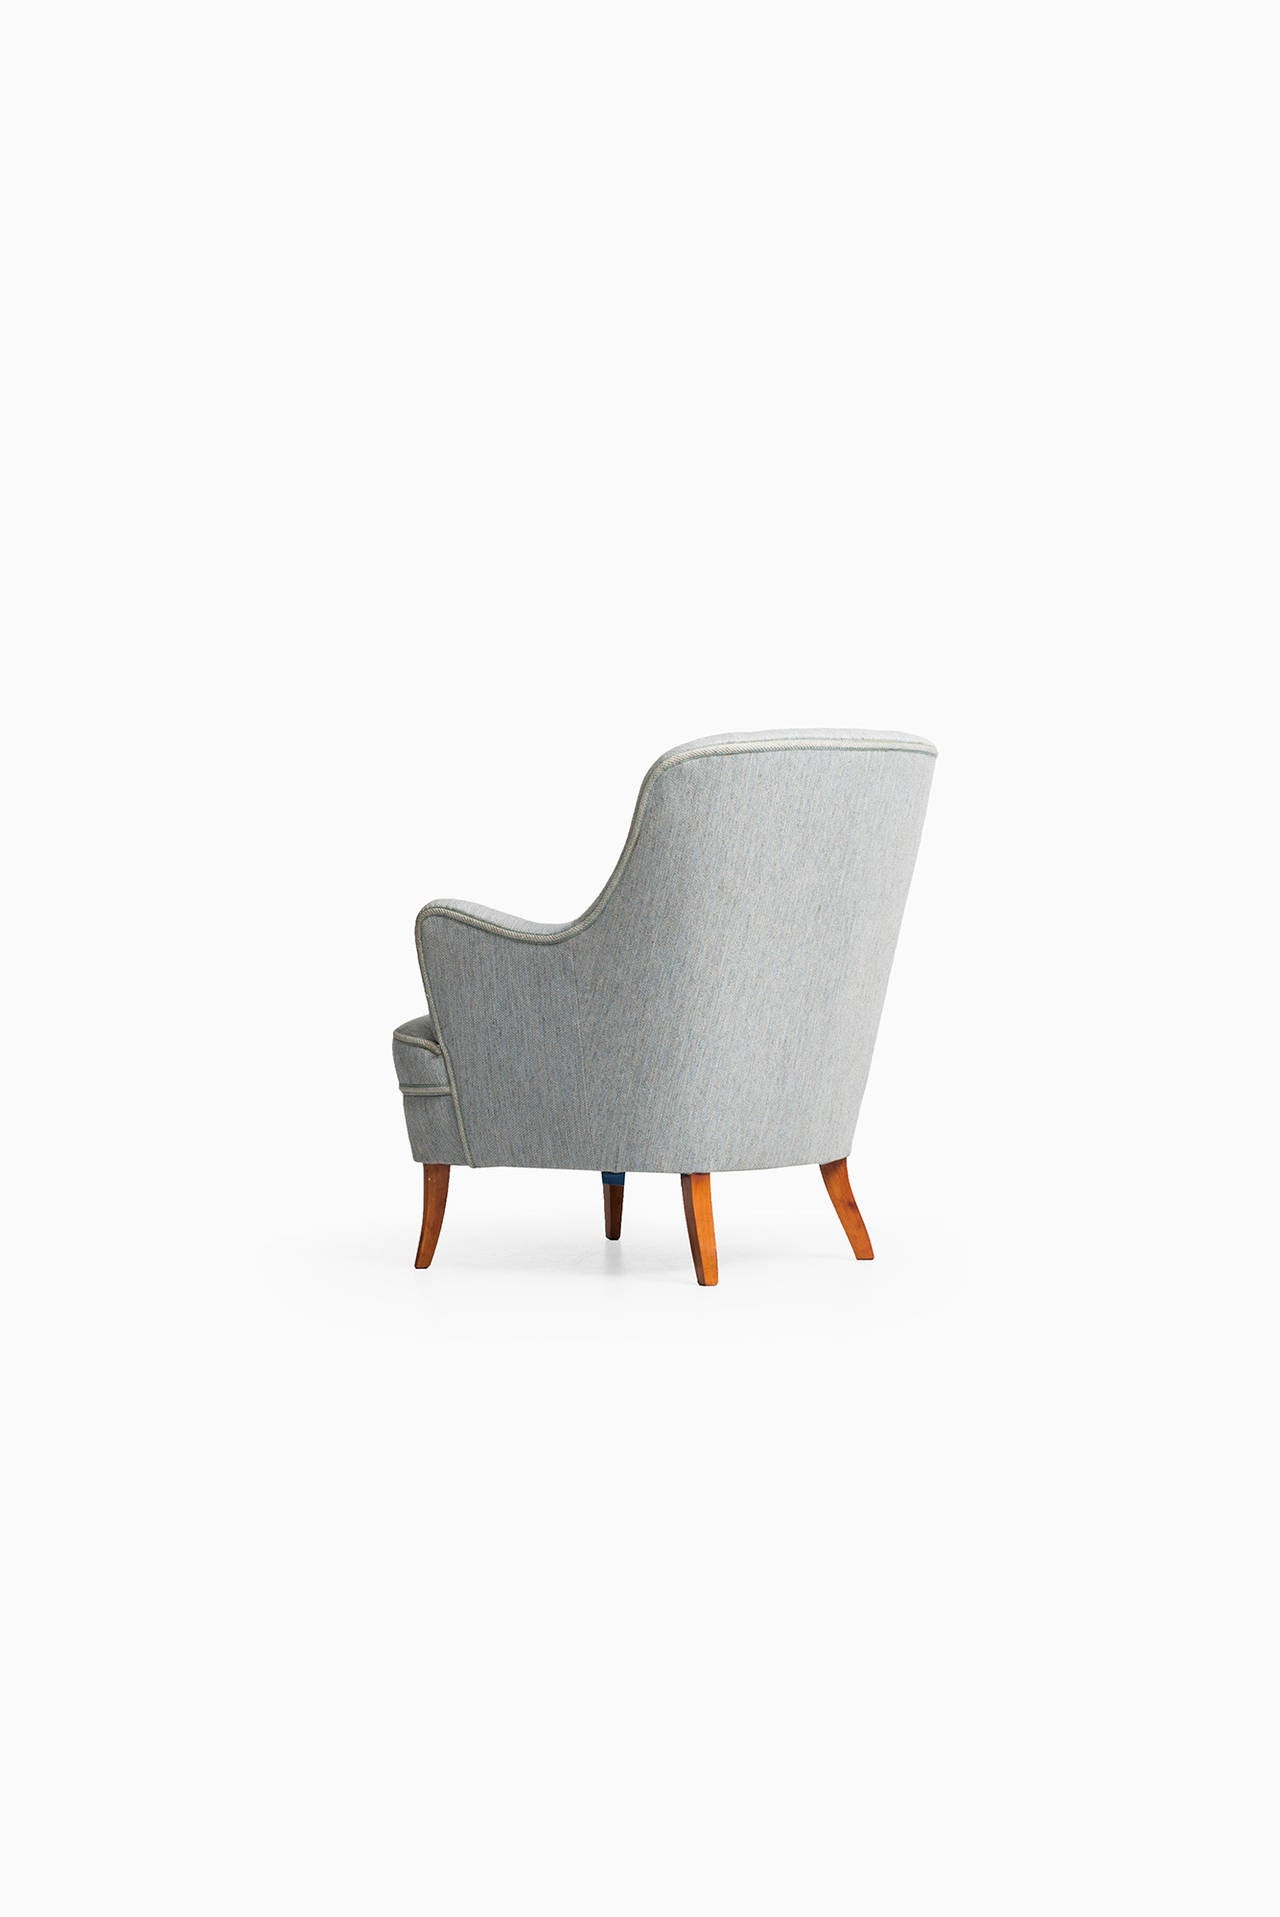 Swedish Carl Malmsten Easy Chair by O.H Sjögren in Sweden For Sale